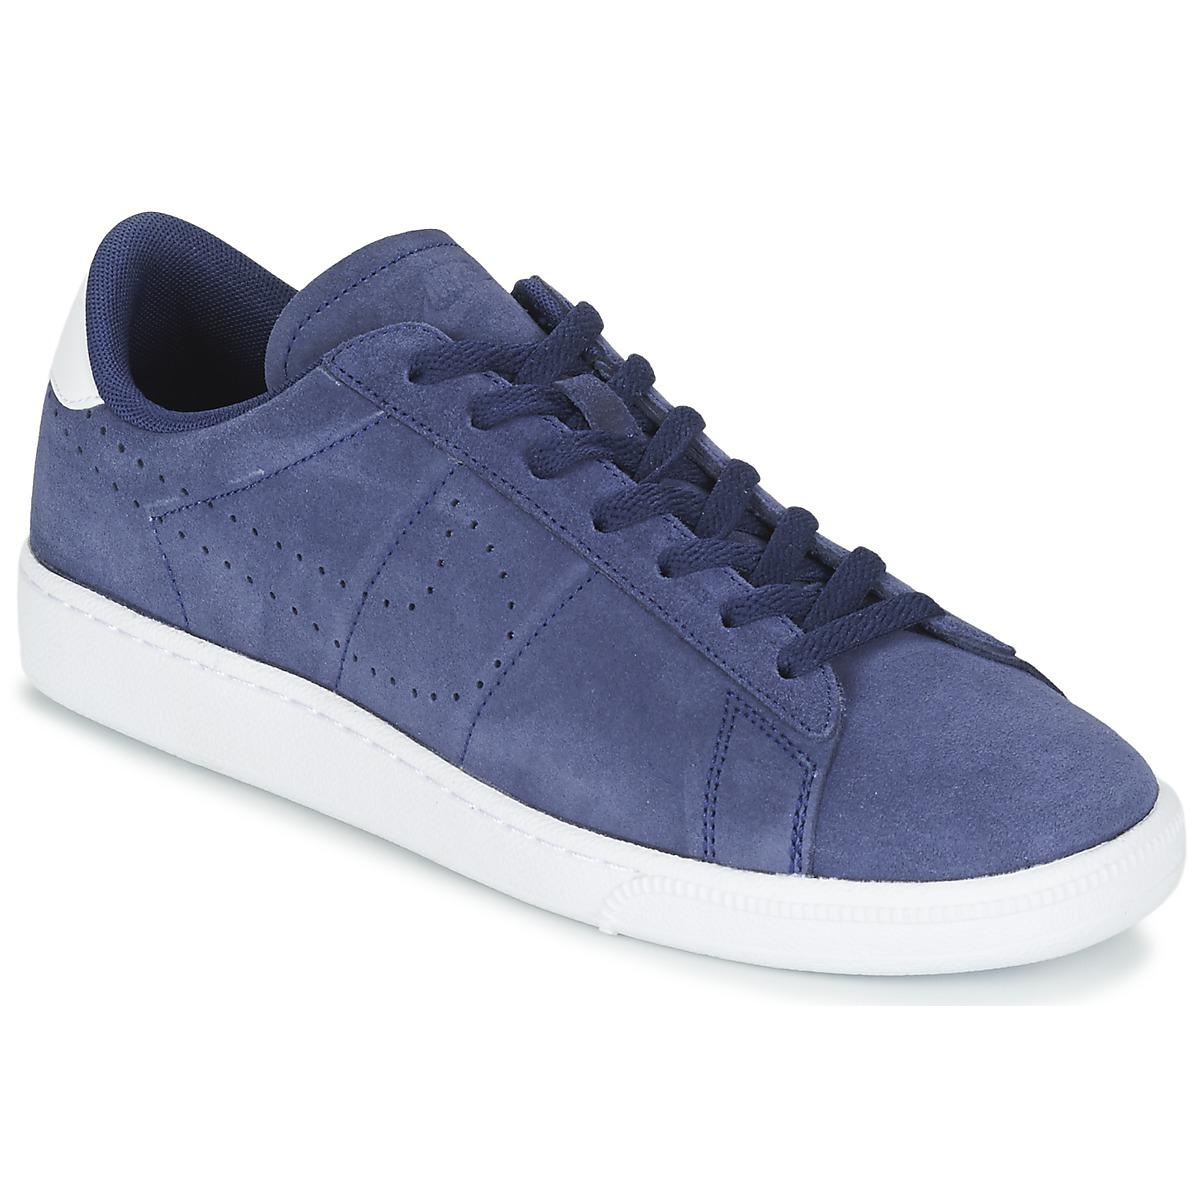 Nike TENNIS CLASSIC CS SUEDE Bleu